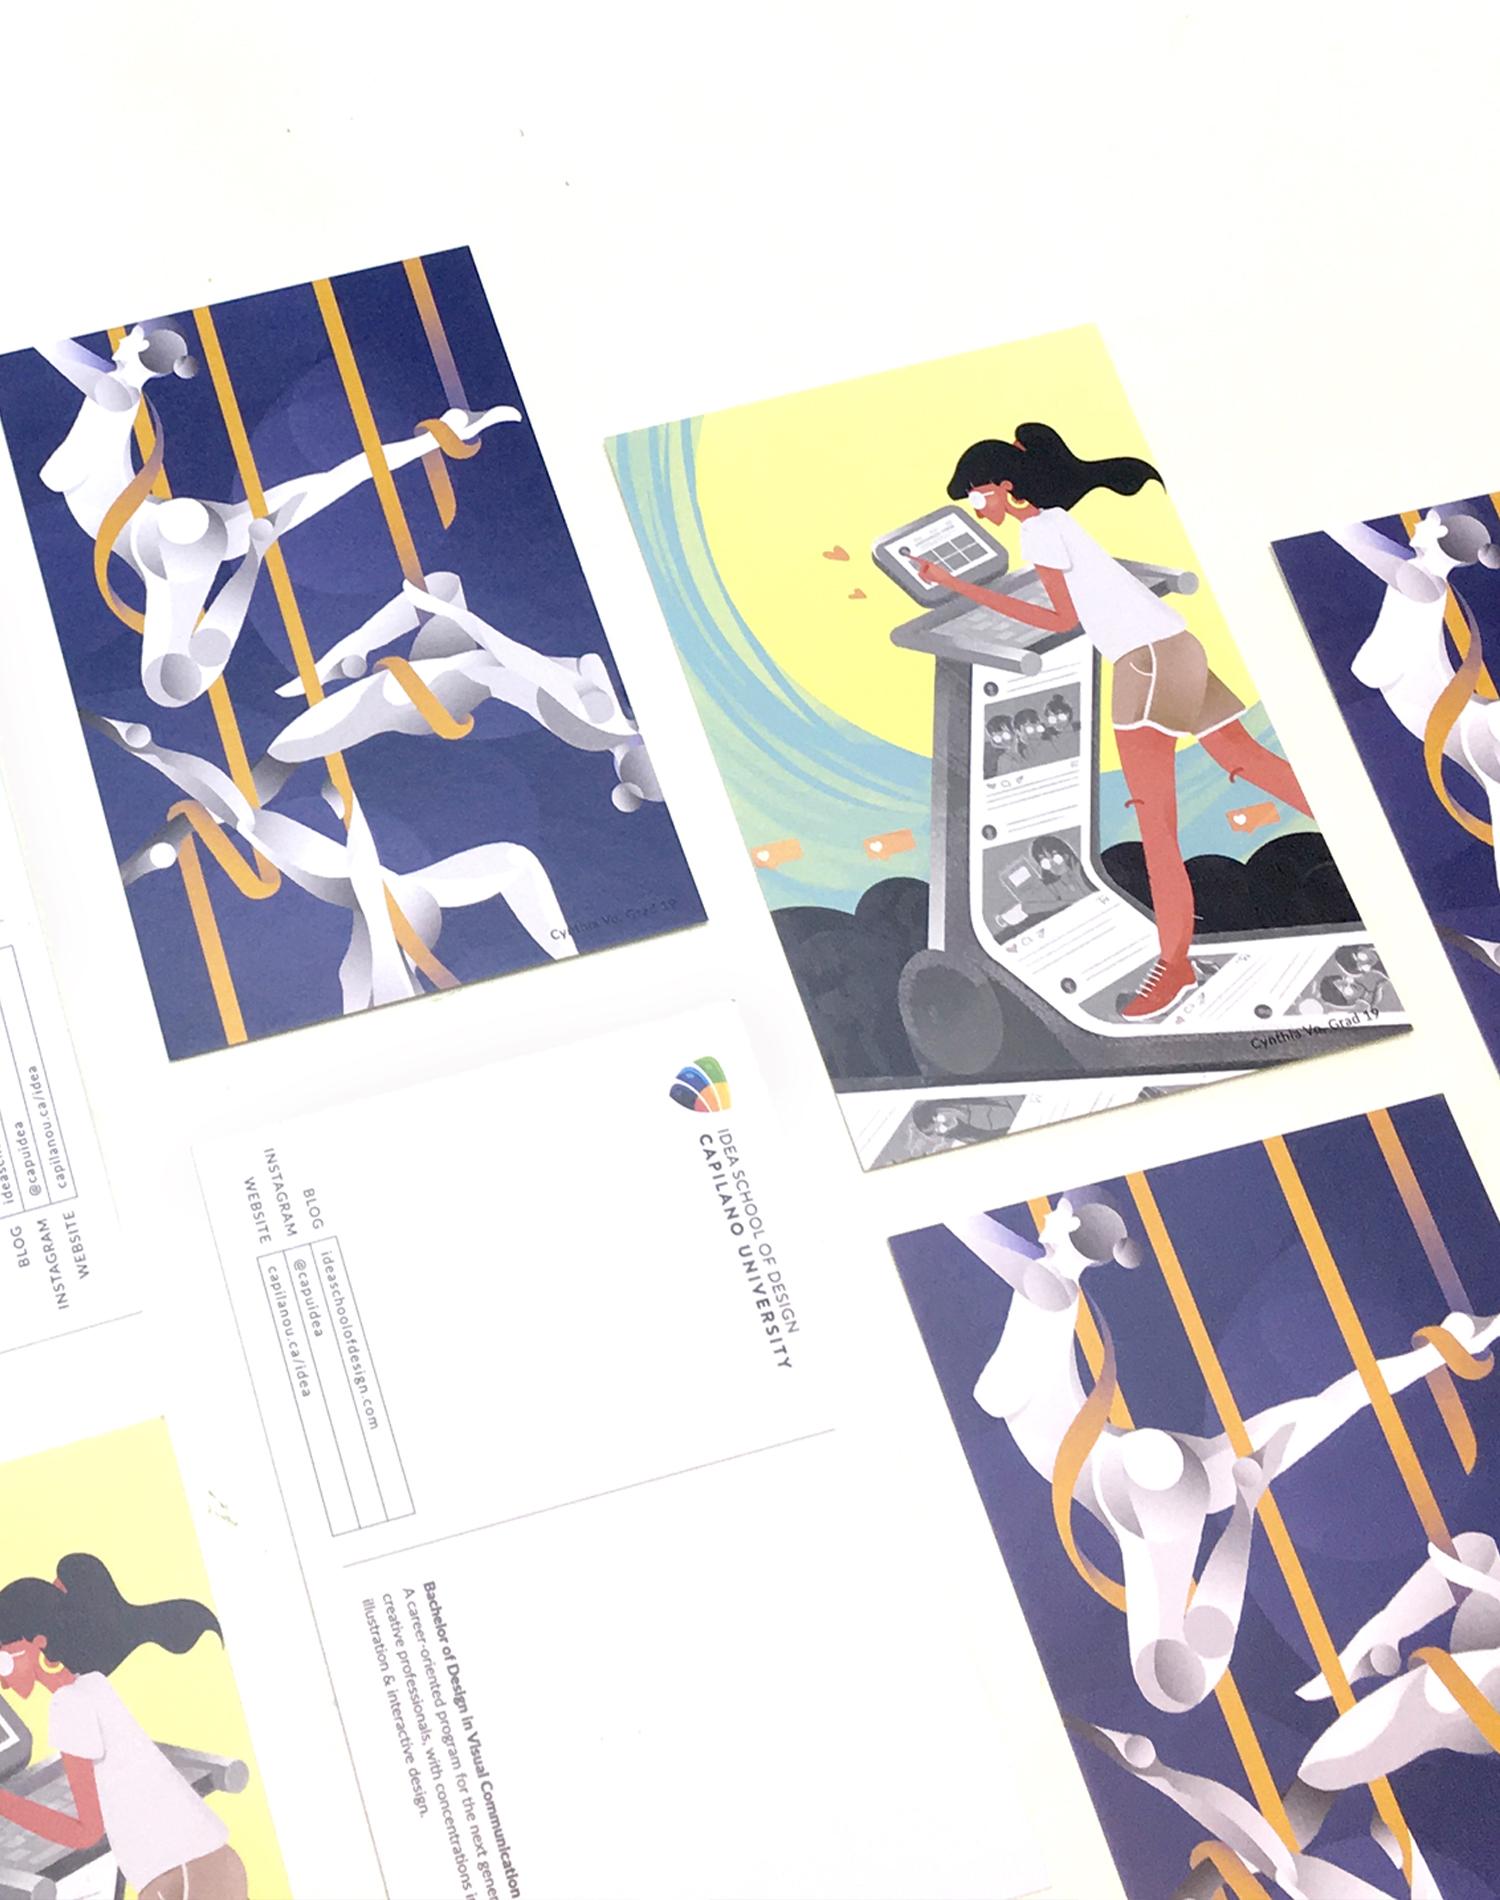 intertwine--capilano-university-postcard-by-design-students-cynthia-tran-vo2.jpg